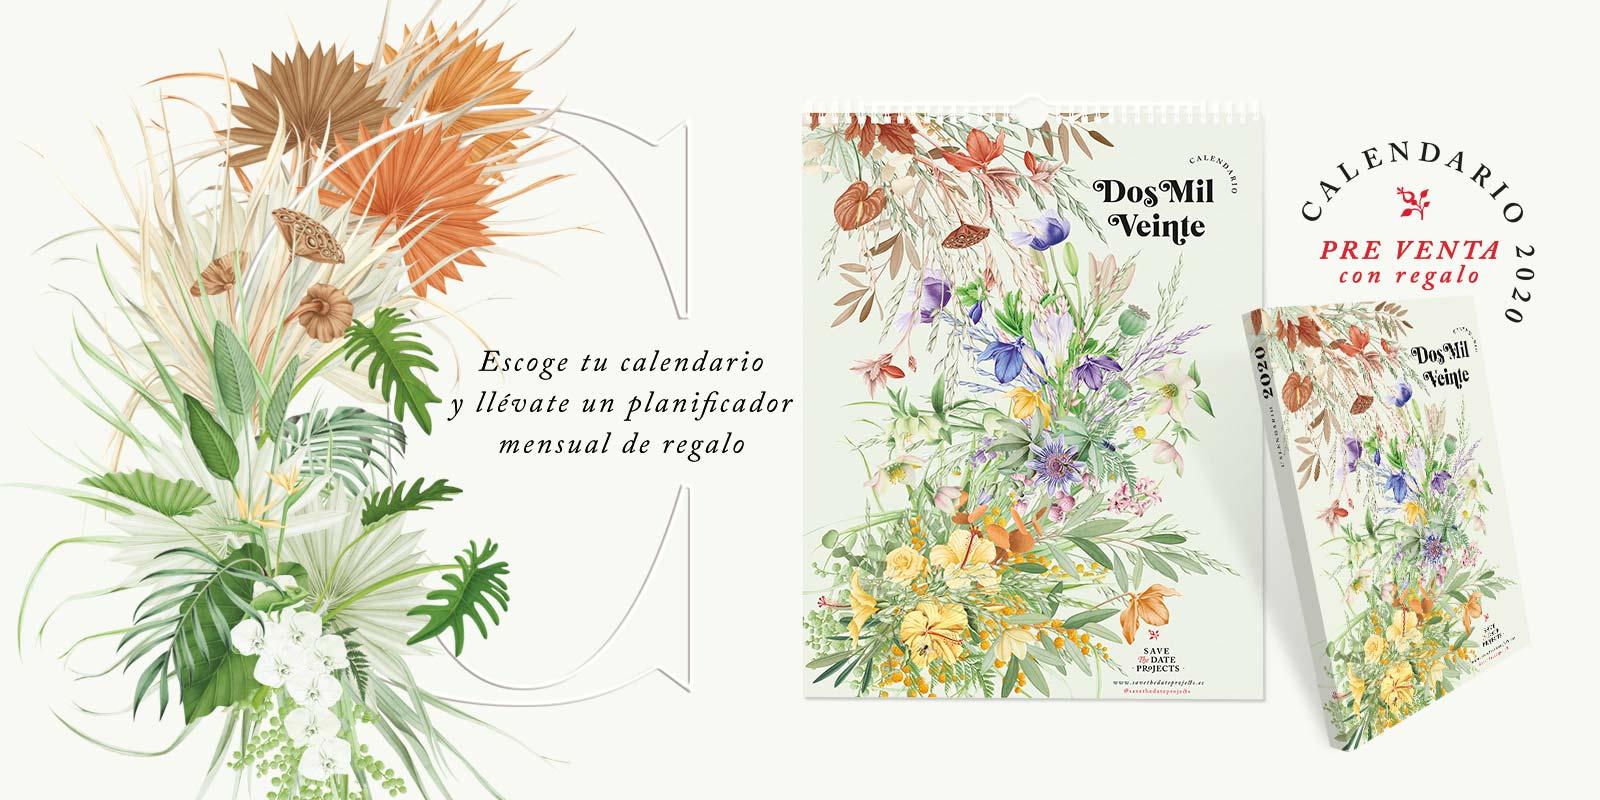 calendarios 2020 savethedateprojects